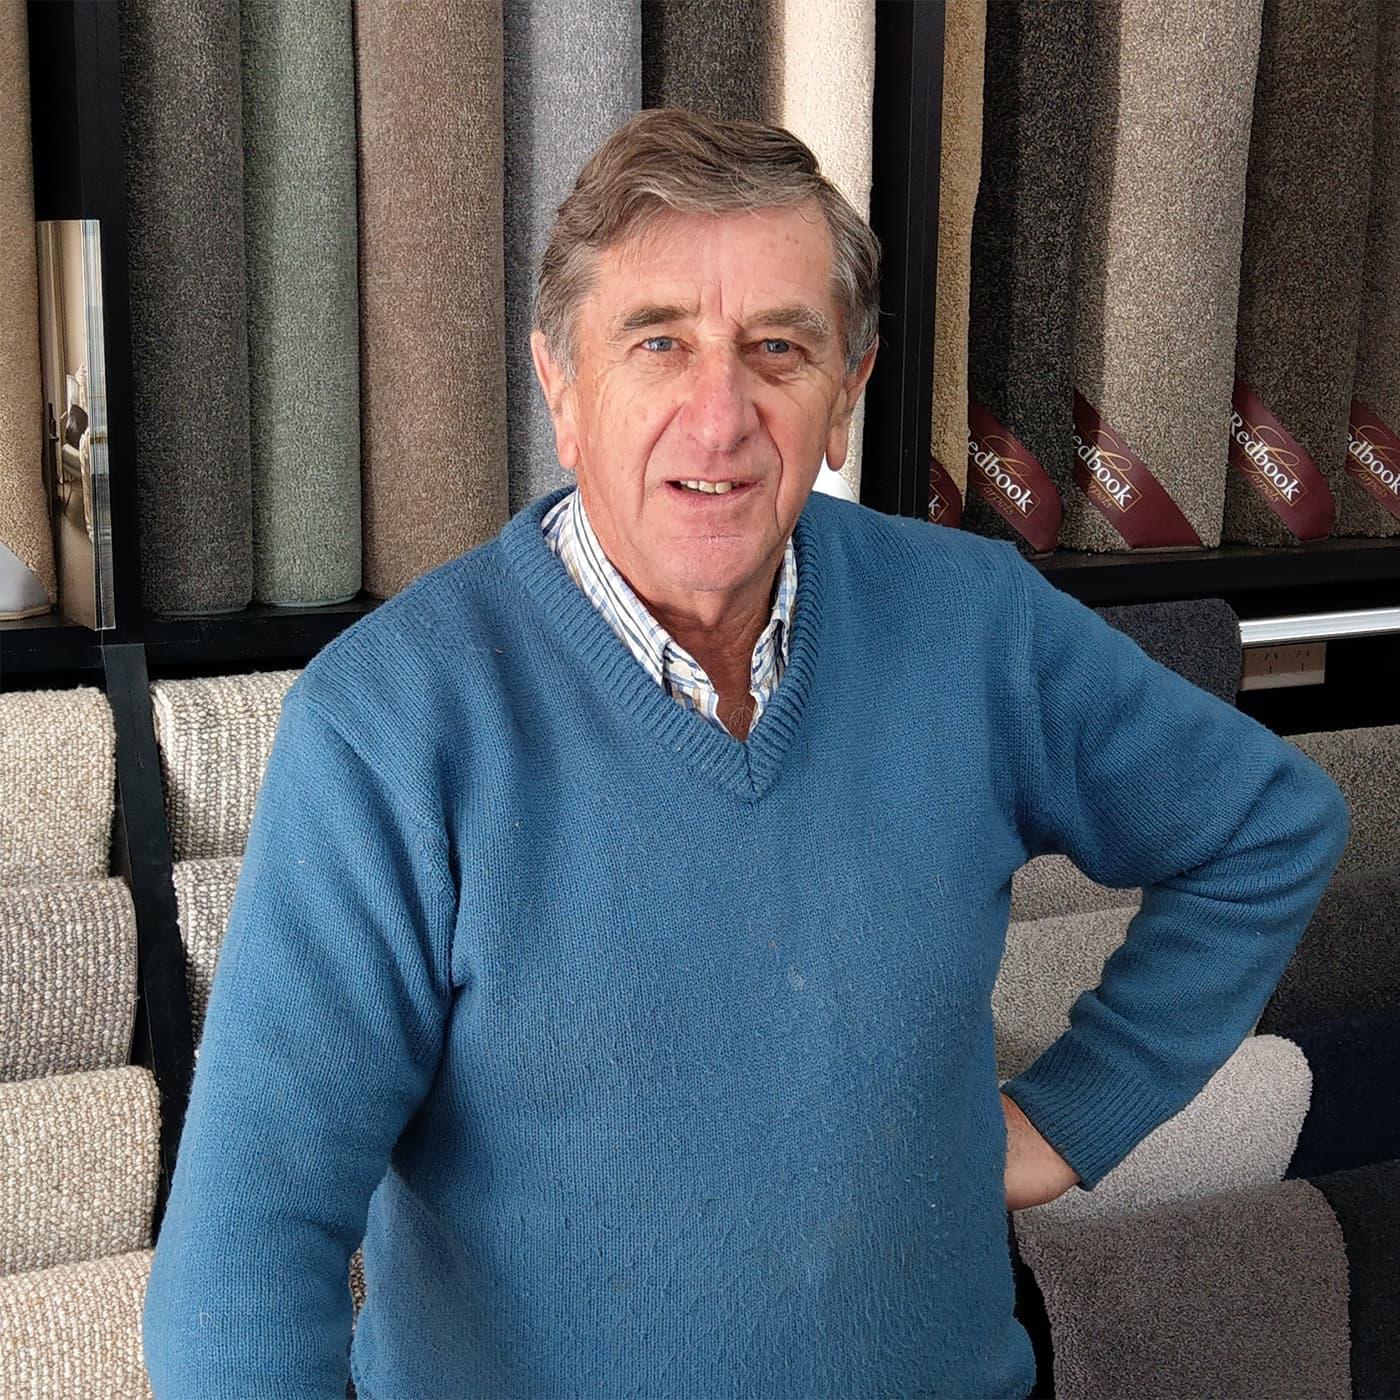 John Morgan, Flooring Consultant at Creme